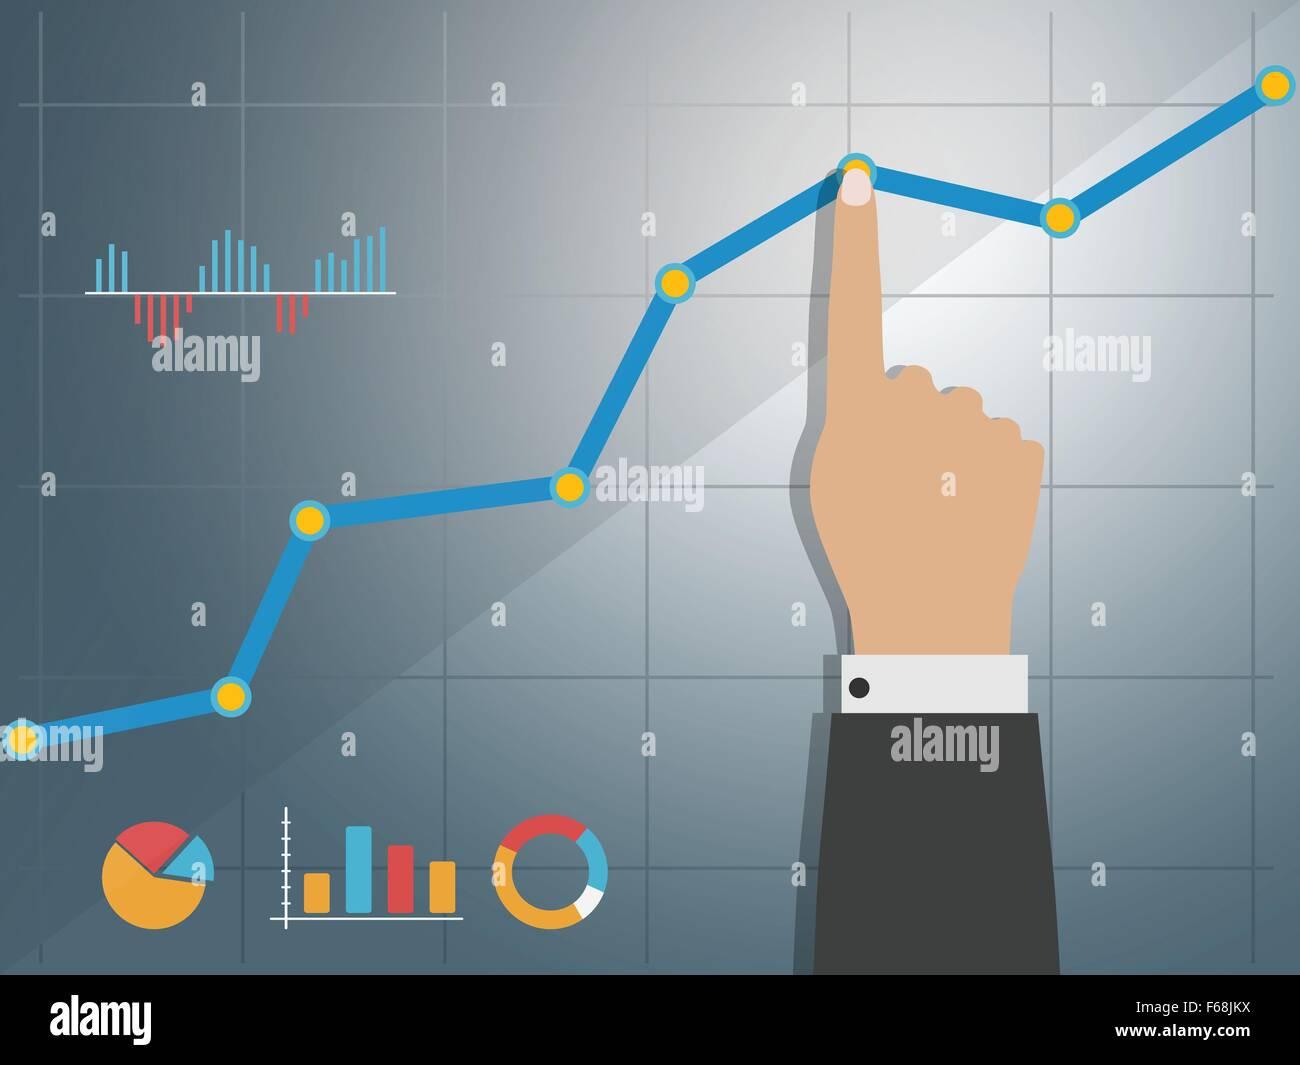 Economic Growth Stock Vector Images - Alamy